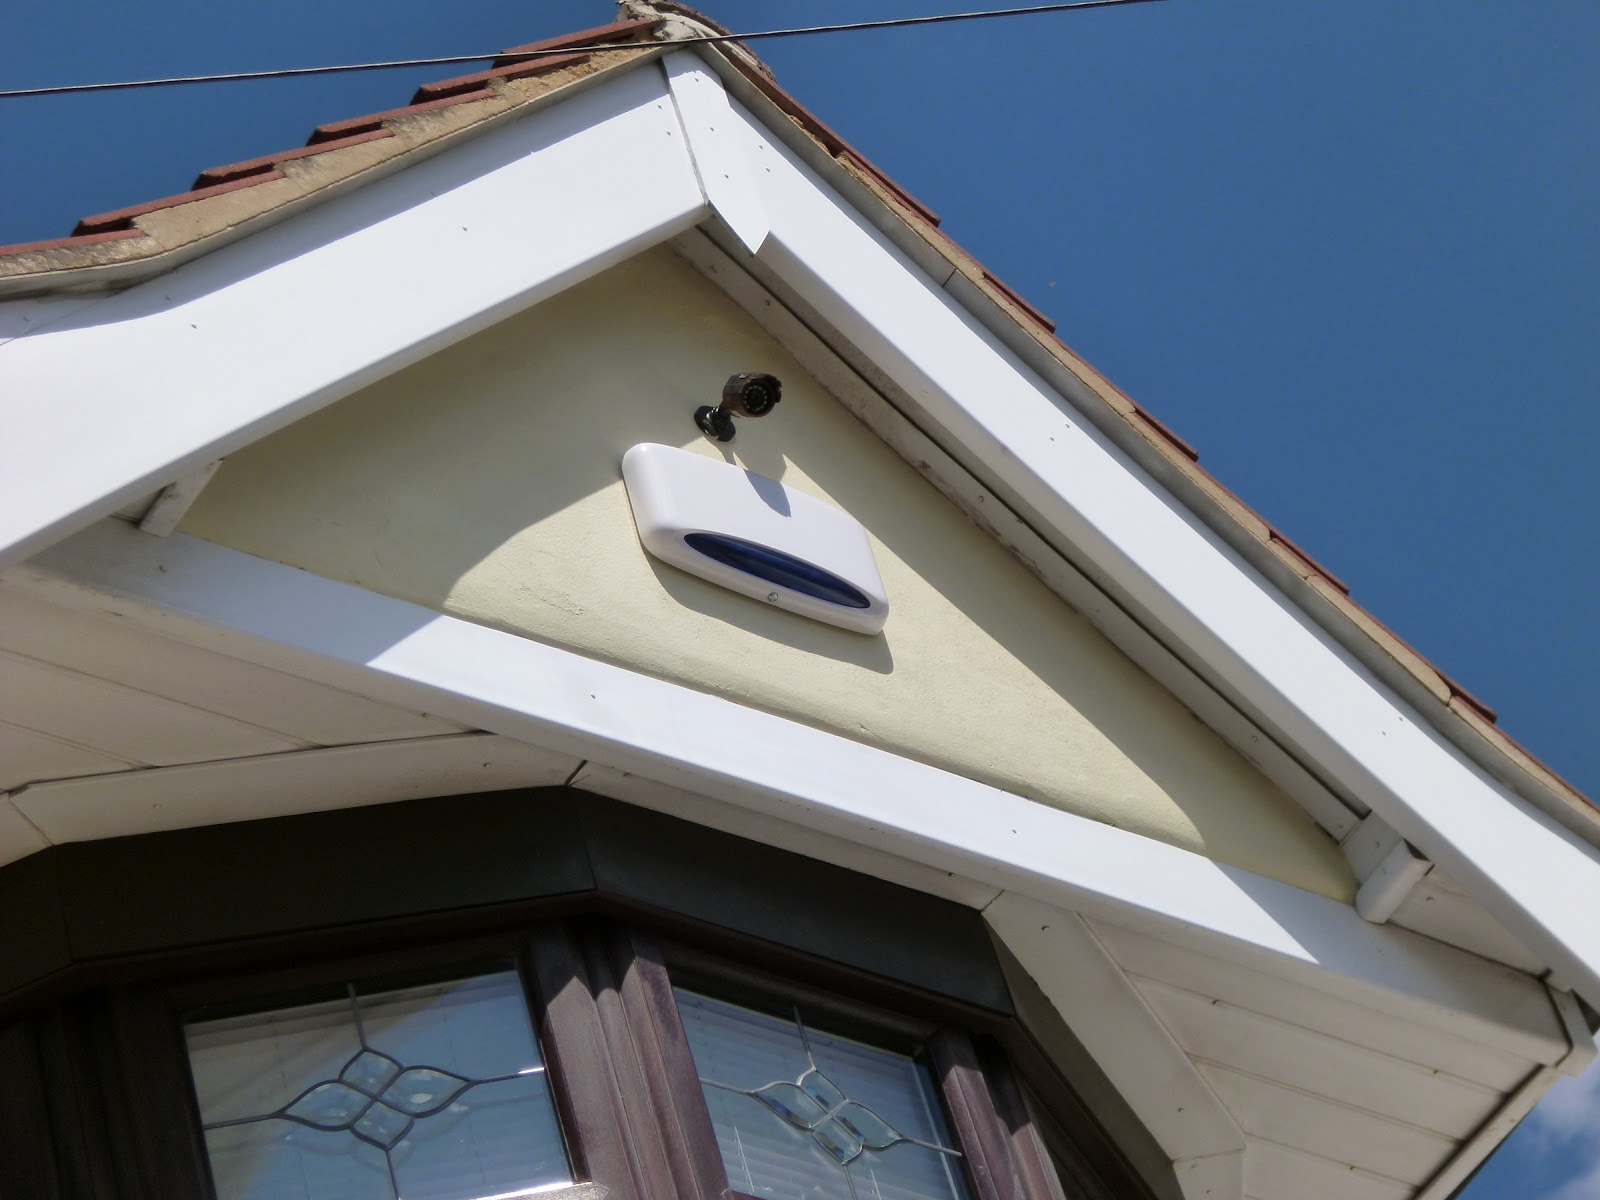 Home_Intruder_Alarm_system.JPG